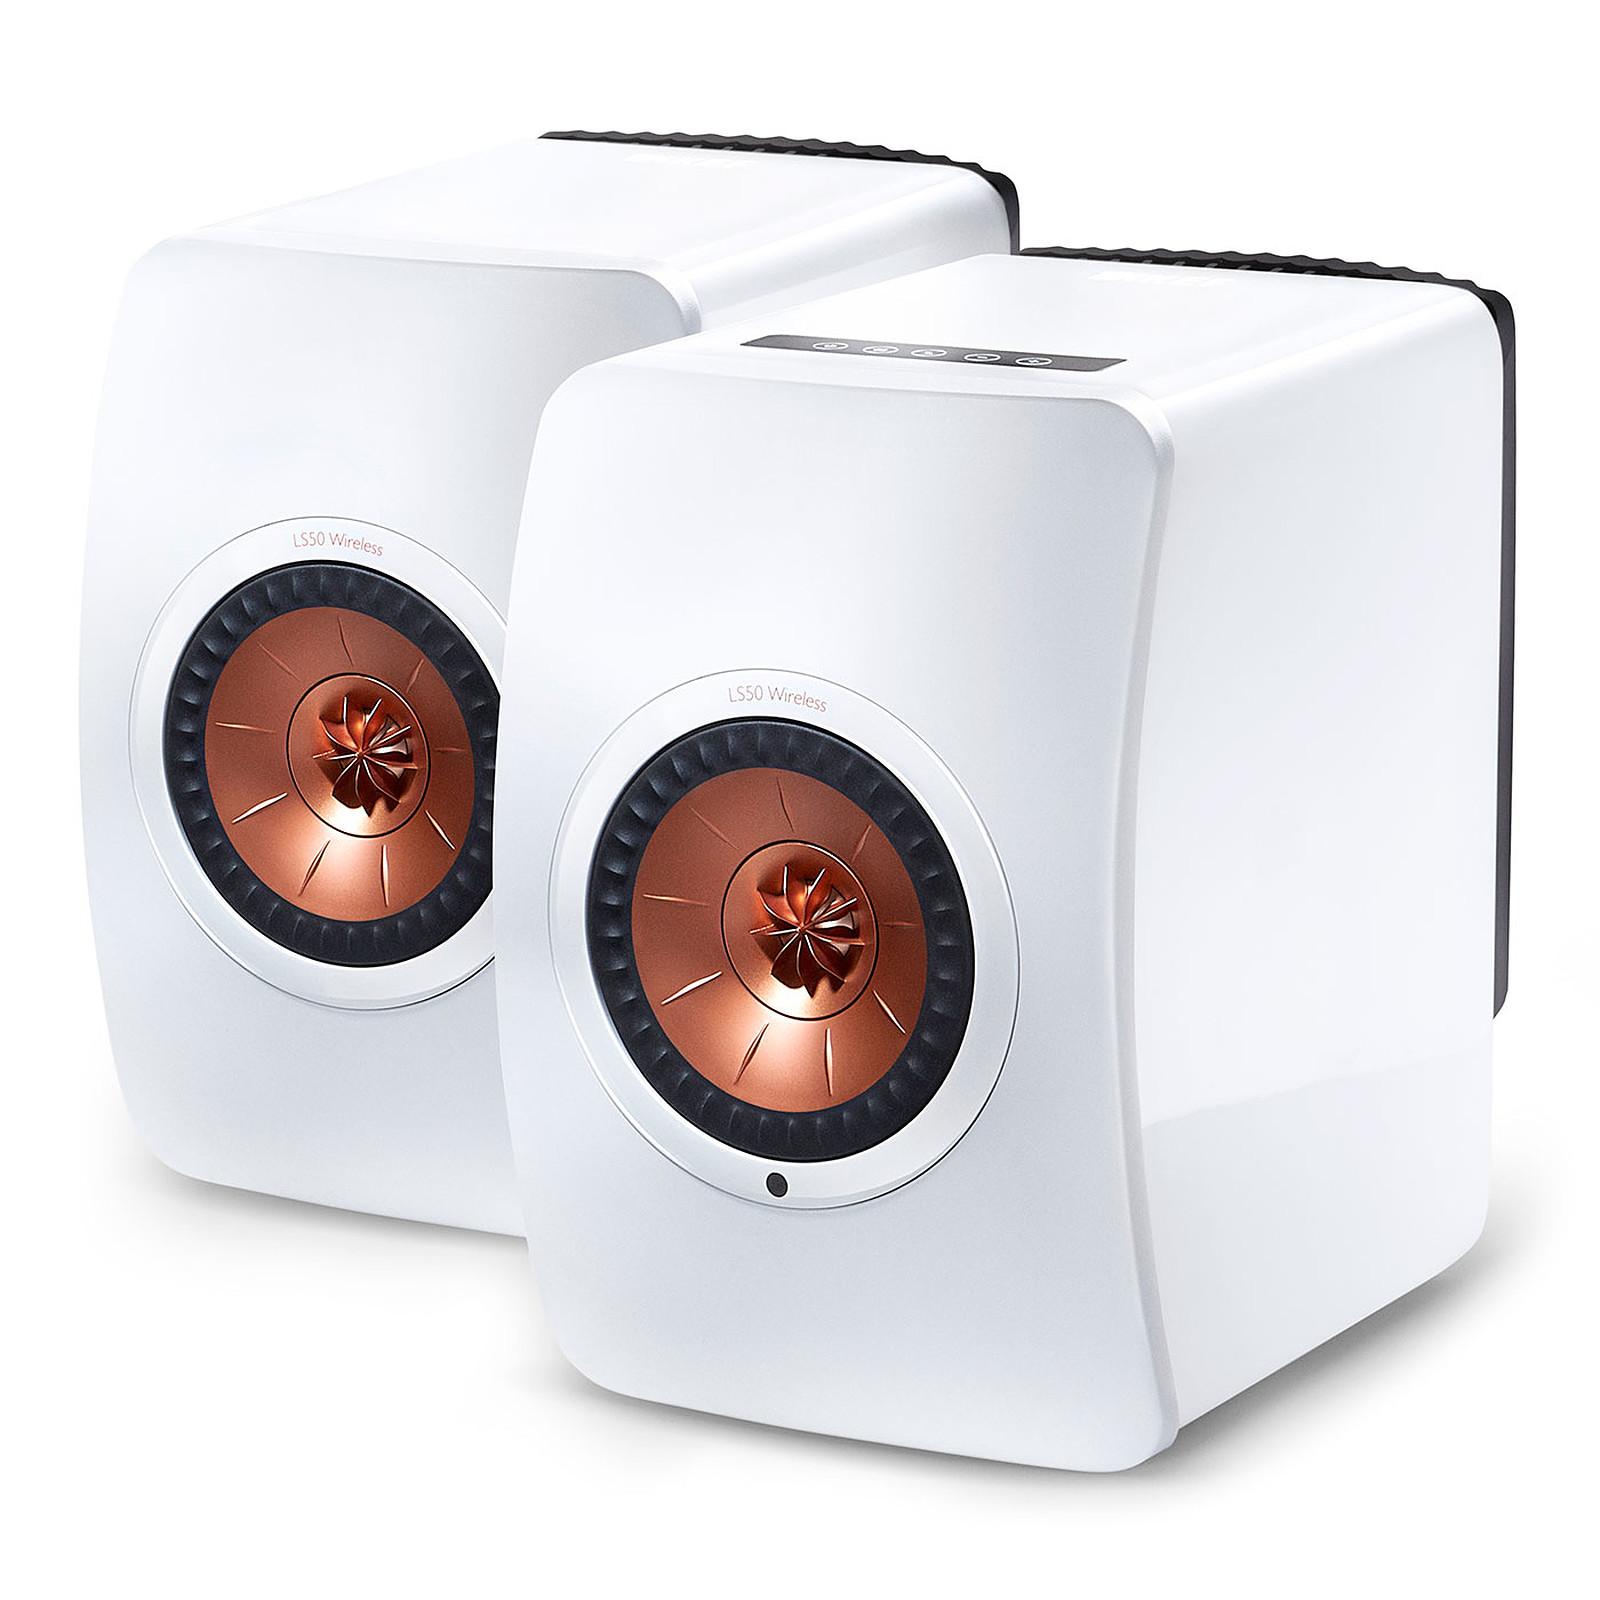 KEF LS50 Wireless Blanc brillant / Cuivre